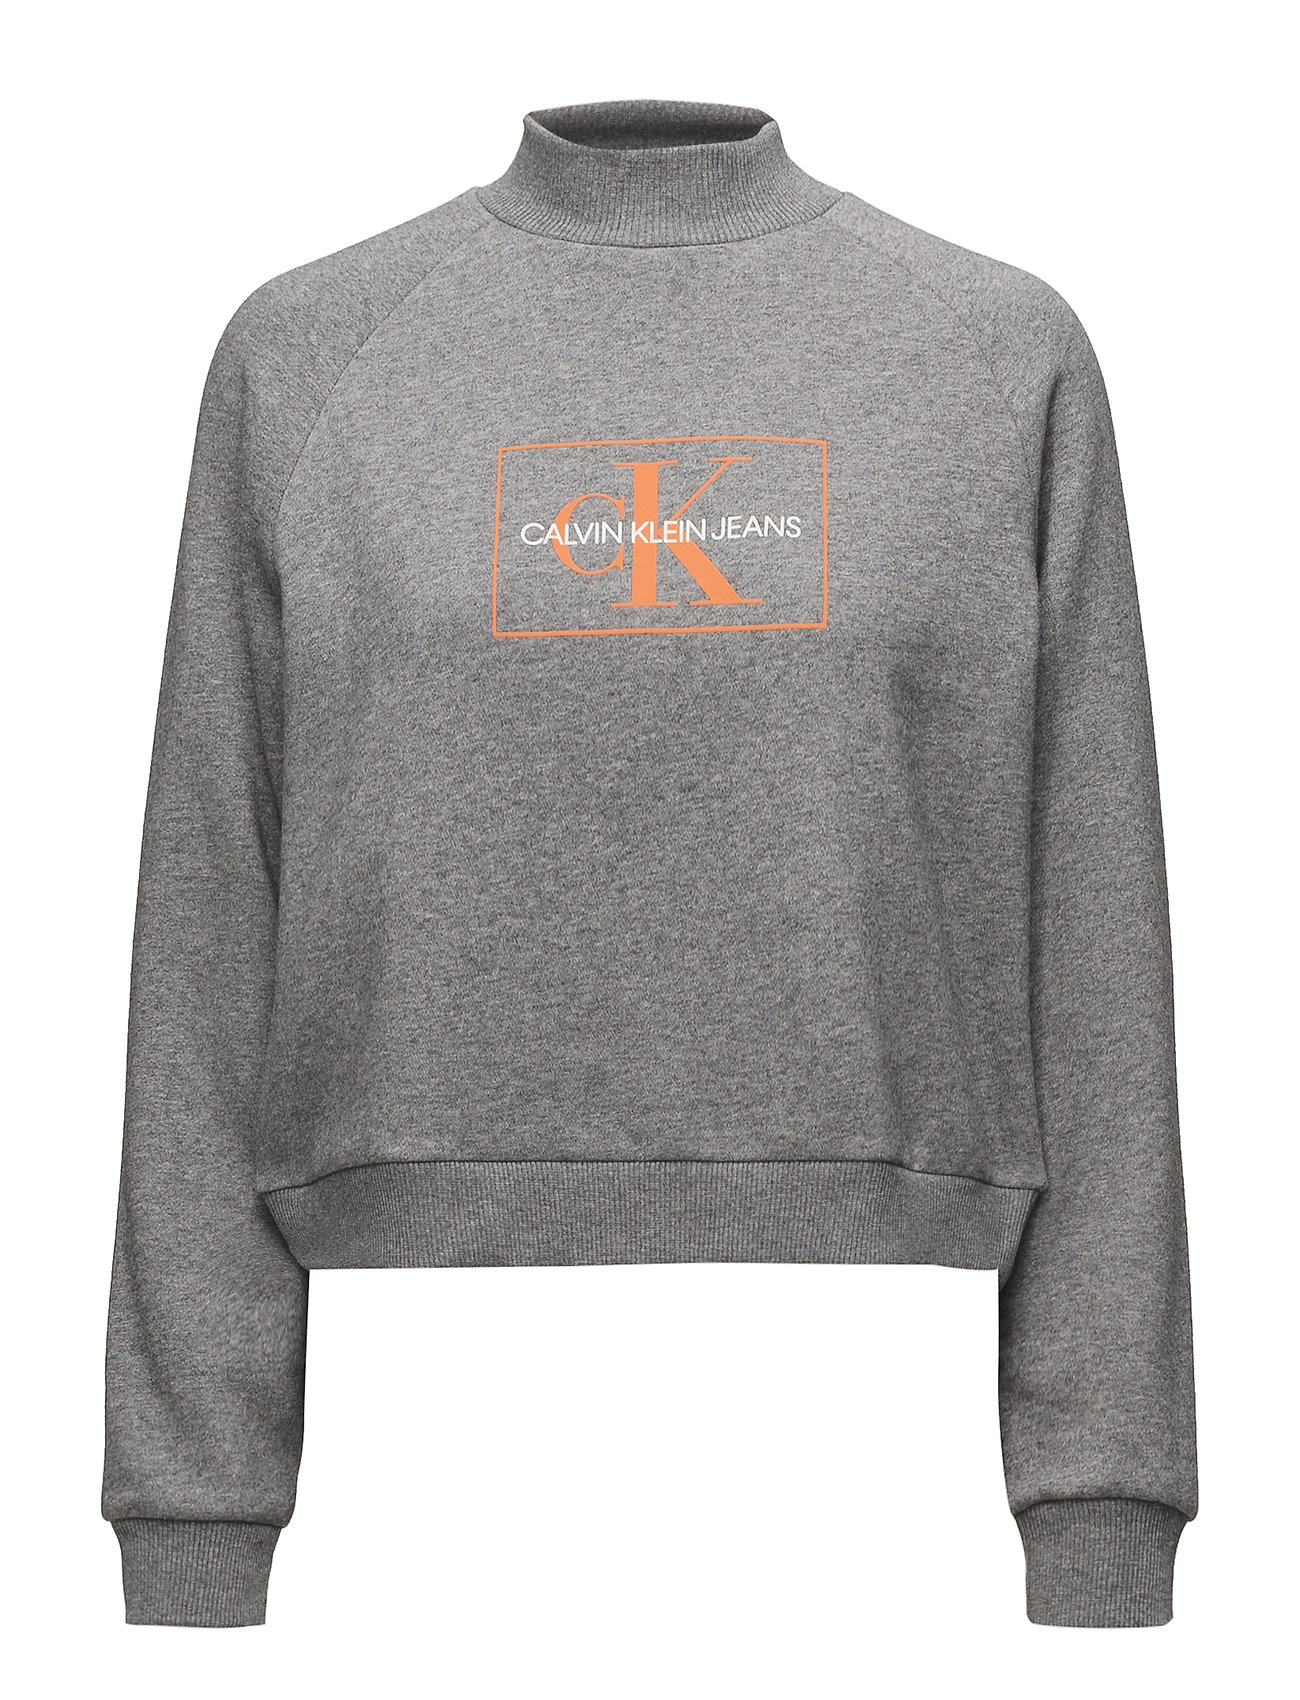 Grey Outline Klein Relmid Monogram Jeans HeatherCalvin oWdrxBeQC